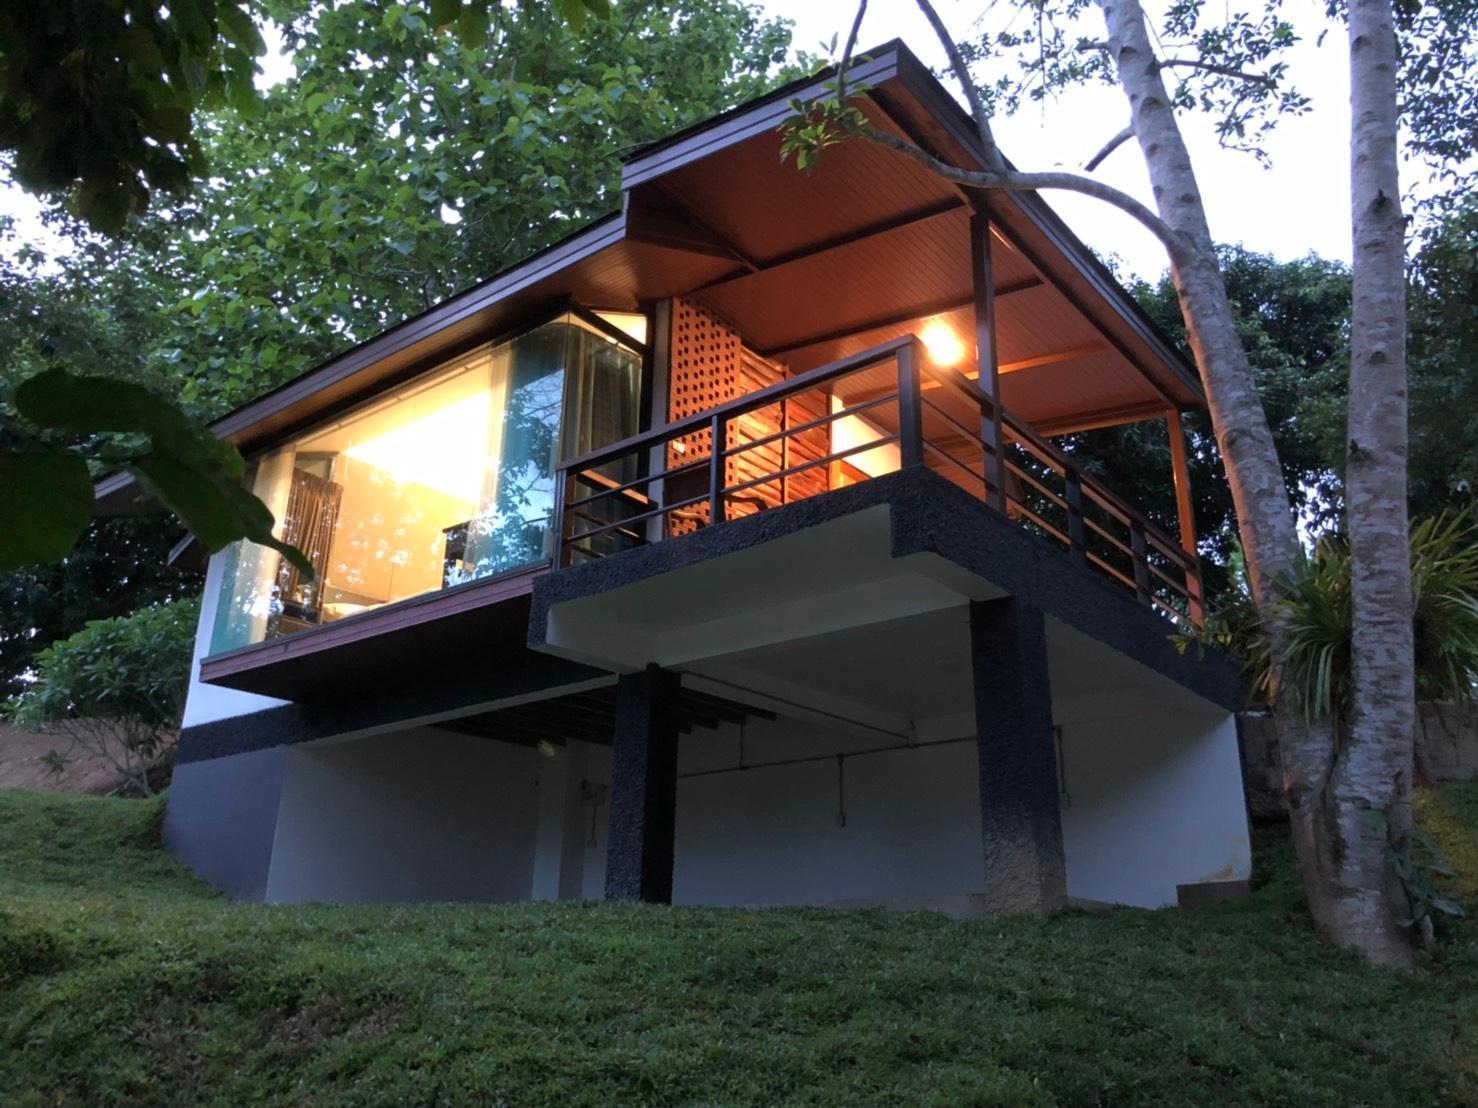 Kawarin River Exclusive วิลลา 1 ห้องนอน 1 ห้องน้ำส่วนตัว ขนาด 68 ตร.ม. – ไทรโยค